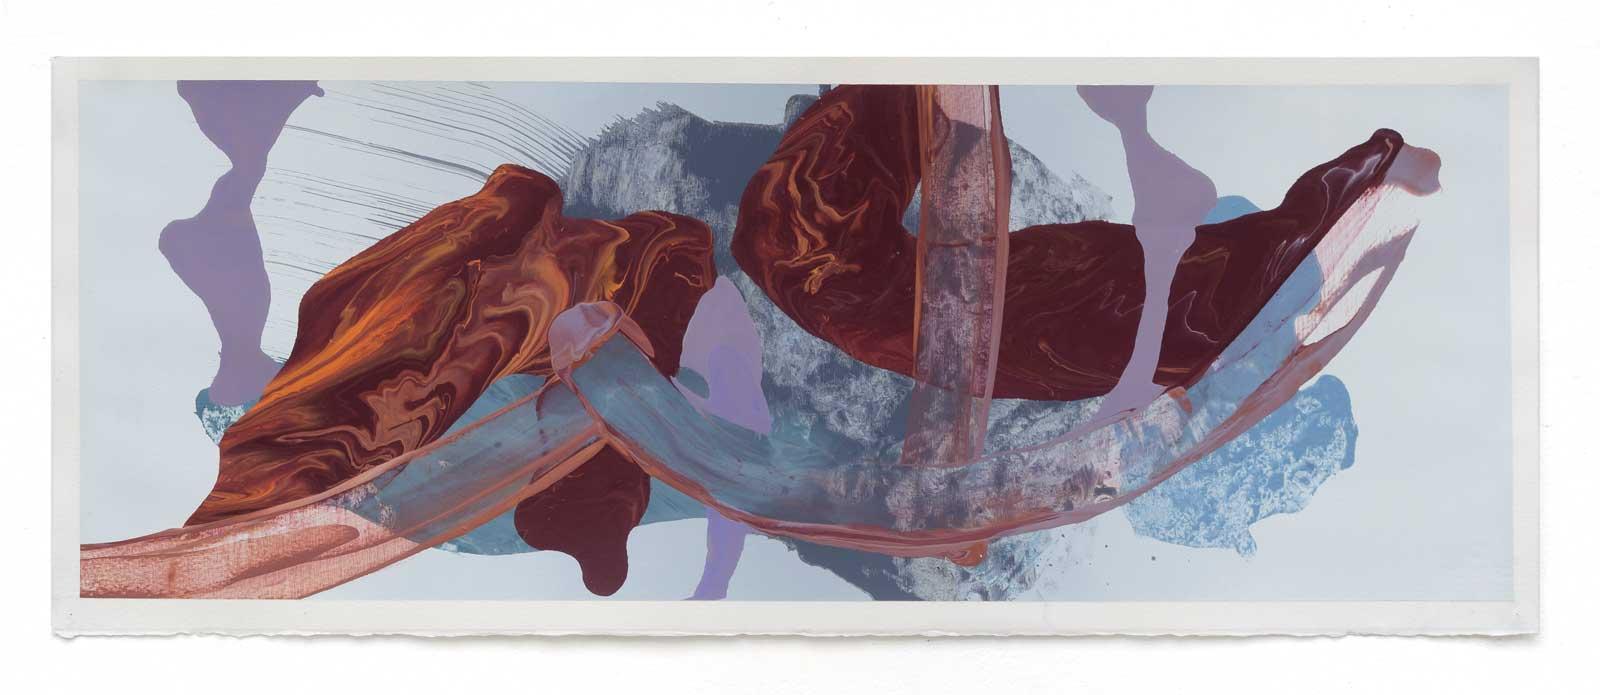 Disruptions-3-oil-on-paper-25.4 cm x 71.12 cm.